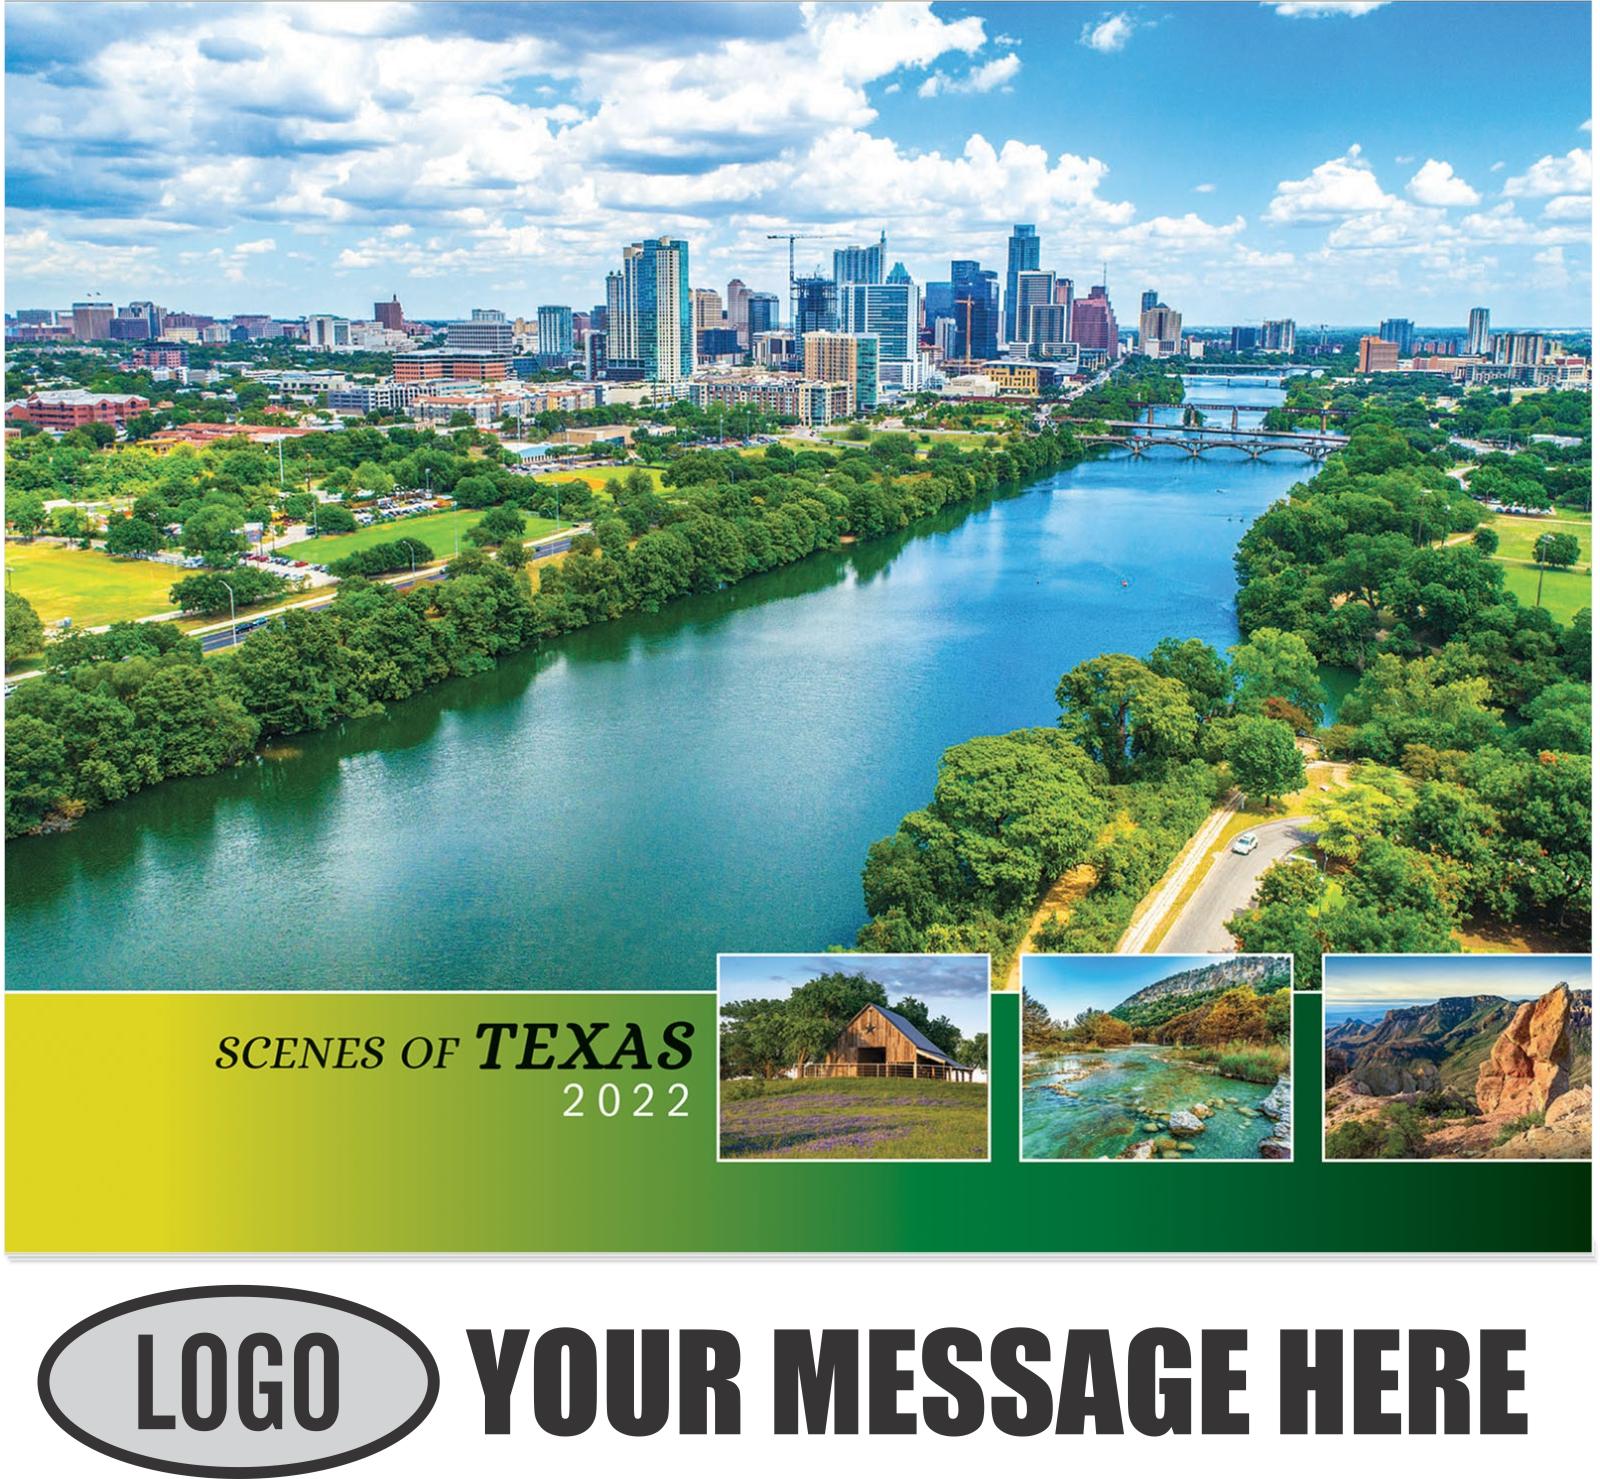 2022 Scenes of Texas Promotional Calendar